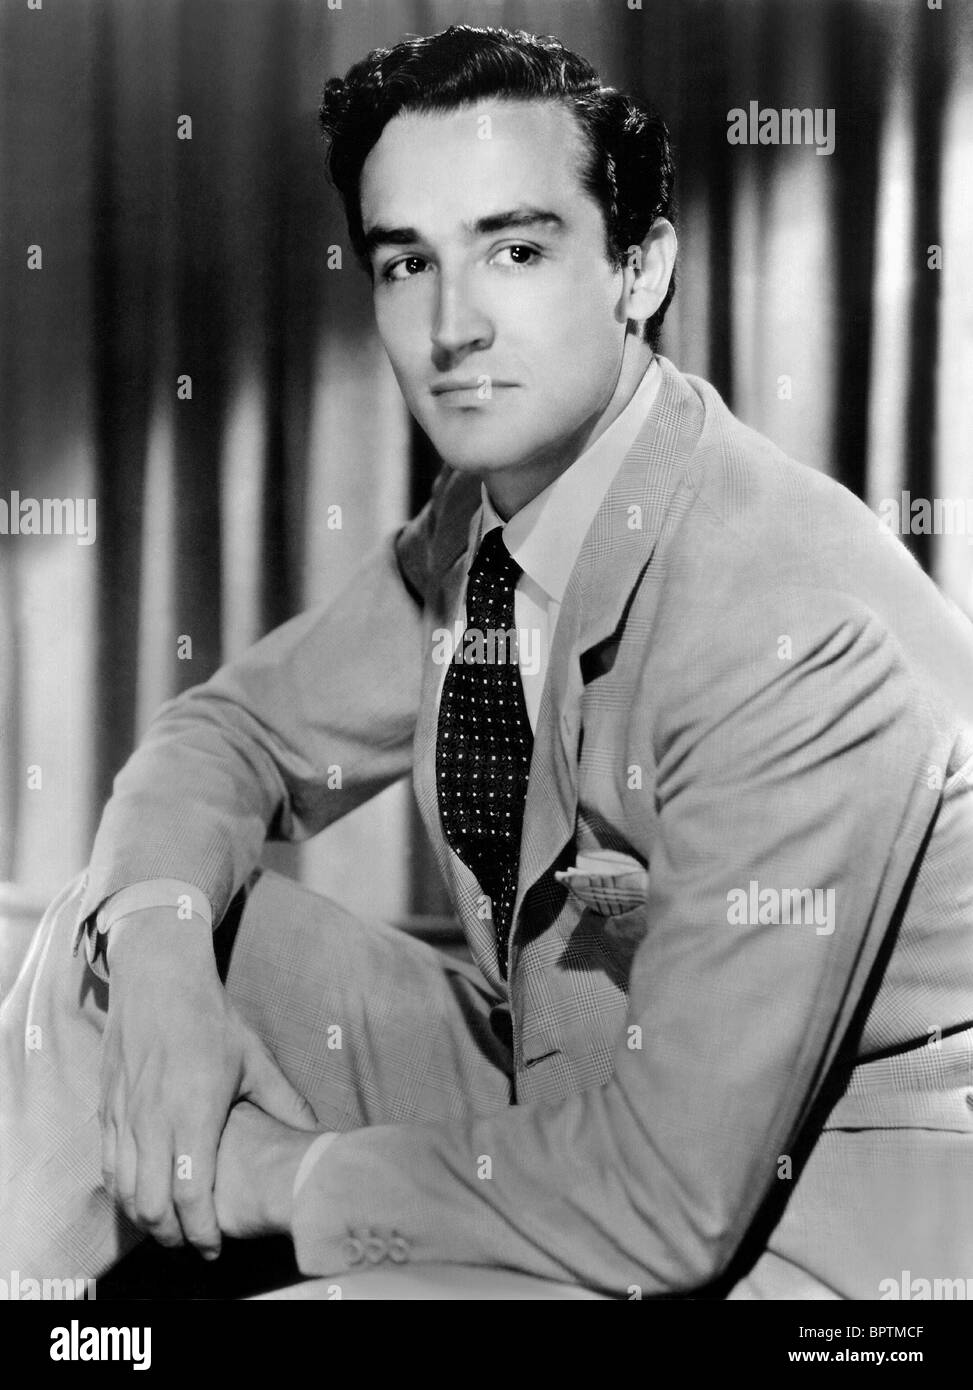 VITTORIO GASSMAN ACTOR (1955) - Stock Image